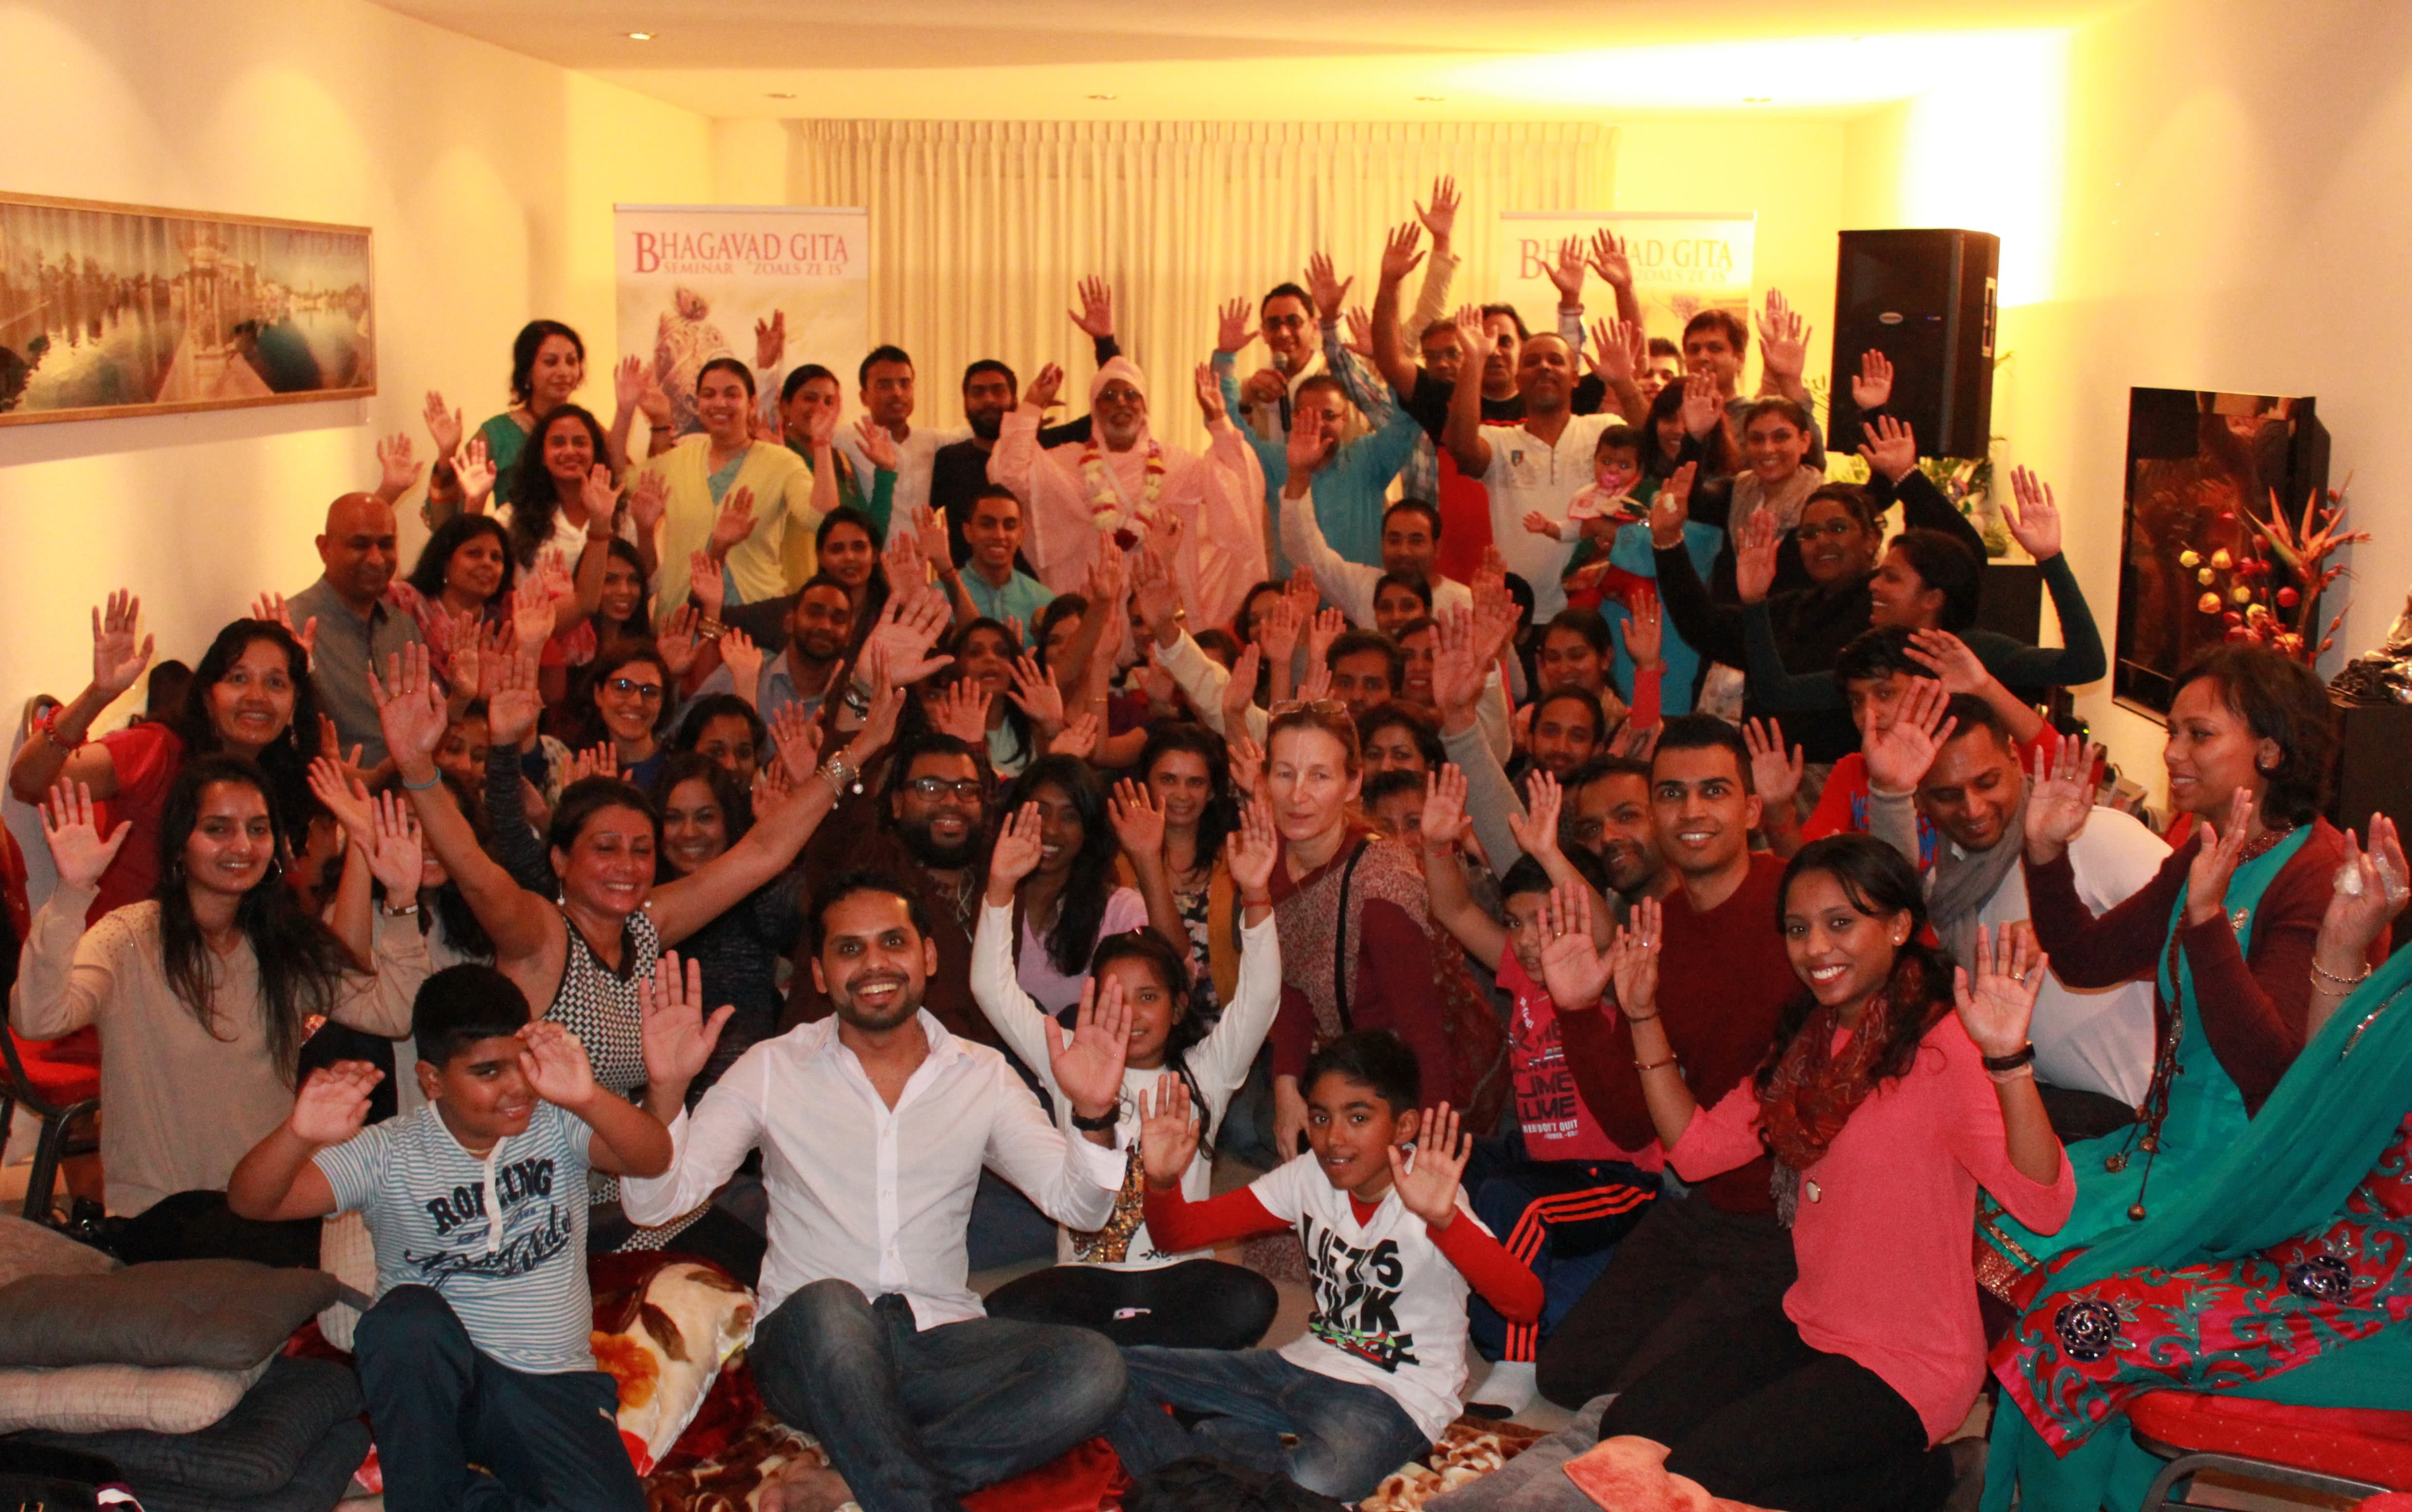 Citaten Uit Bhagavad Gita : Een ervaring op het bhagavad gita seminar